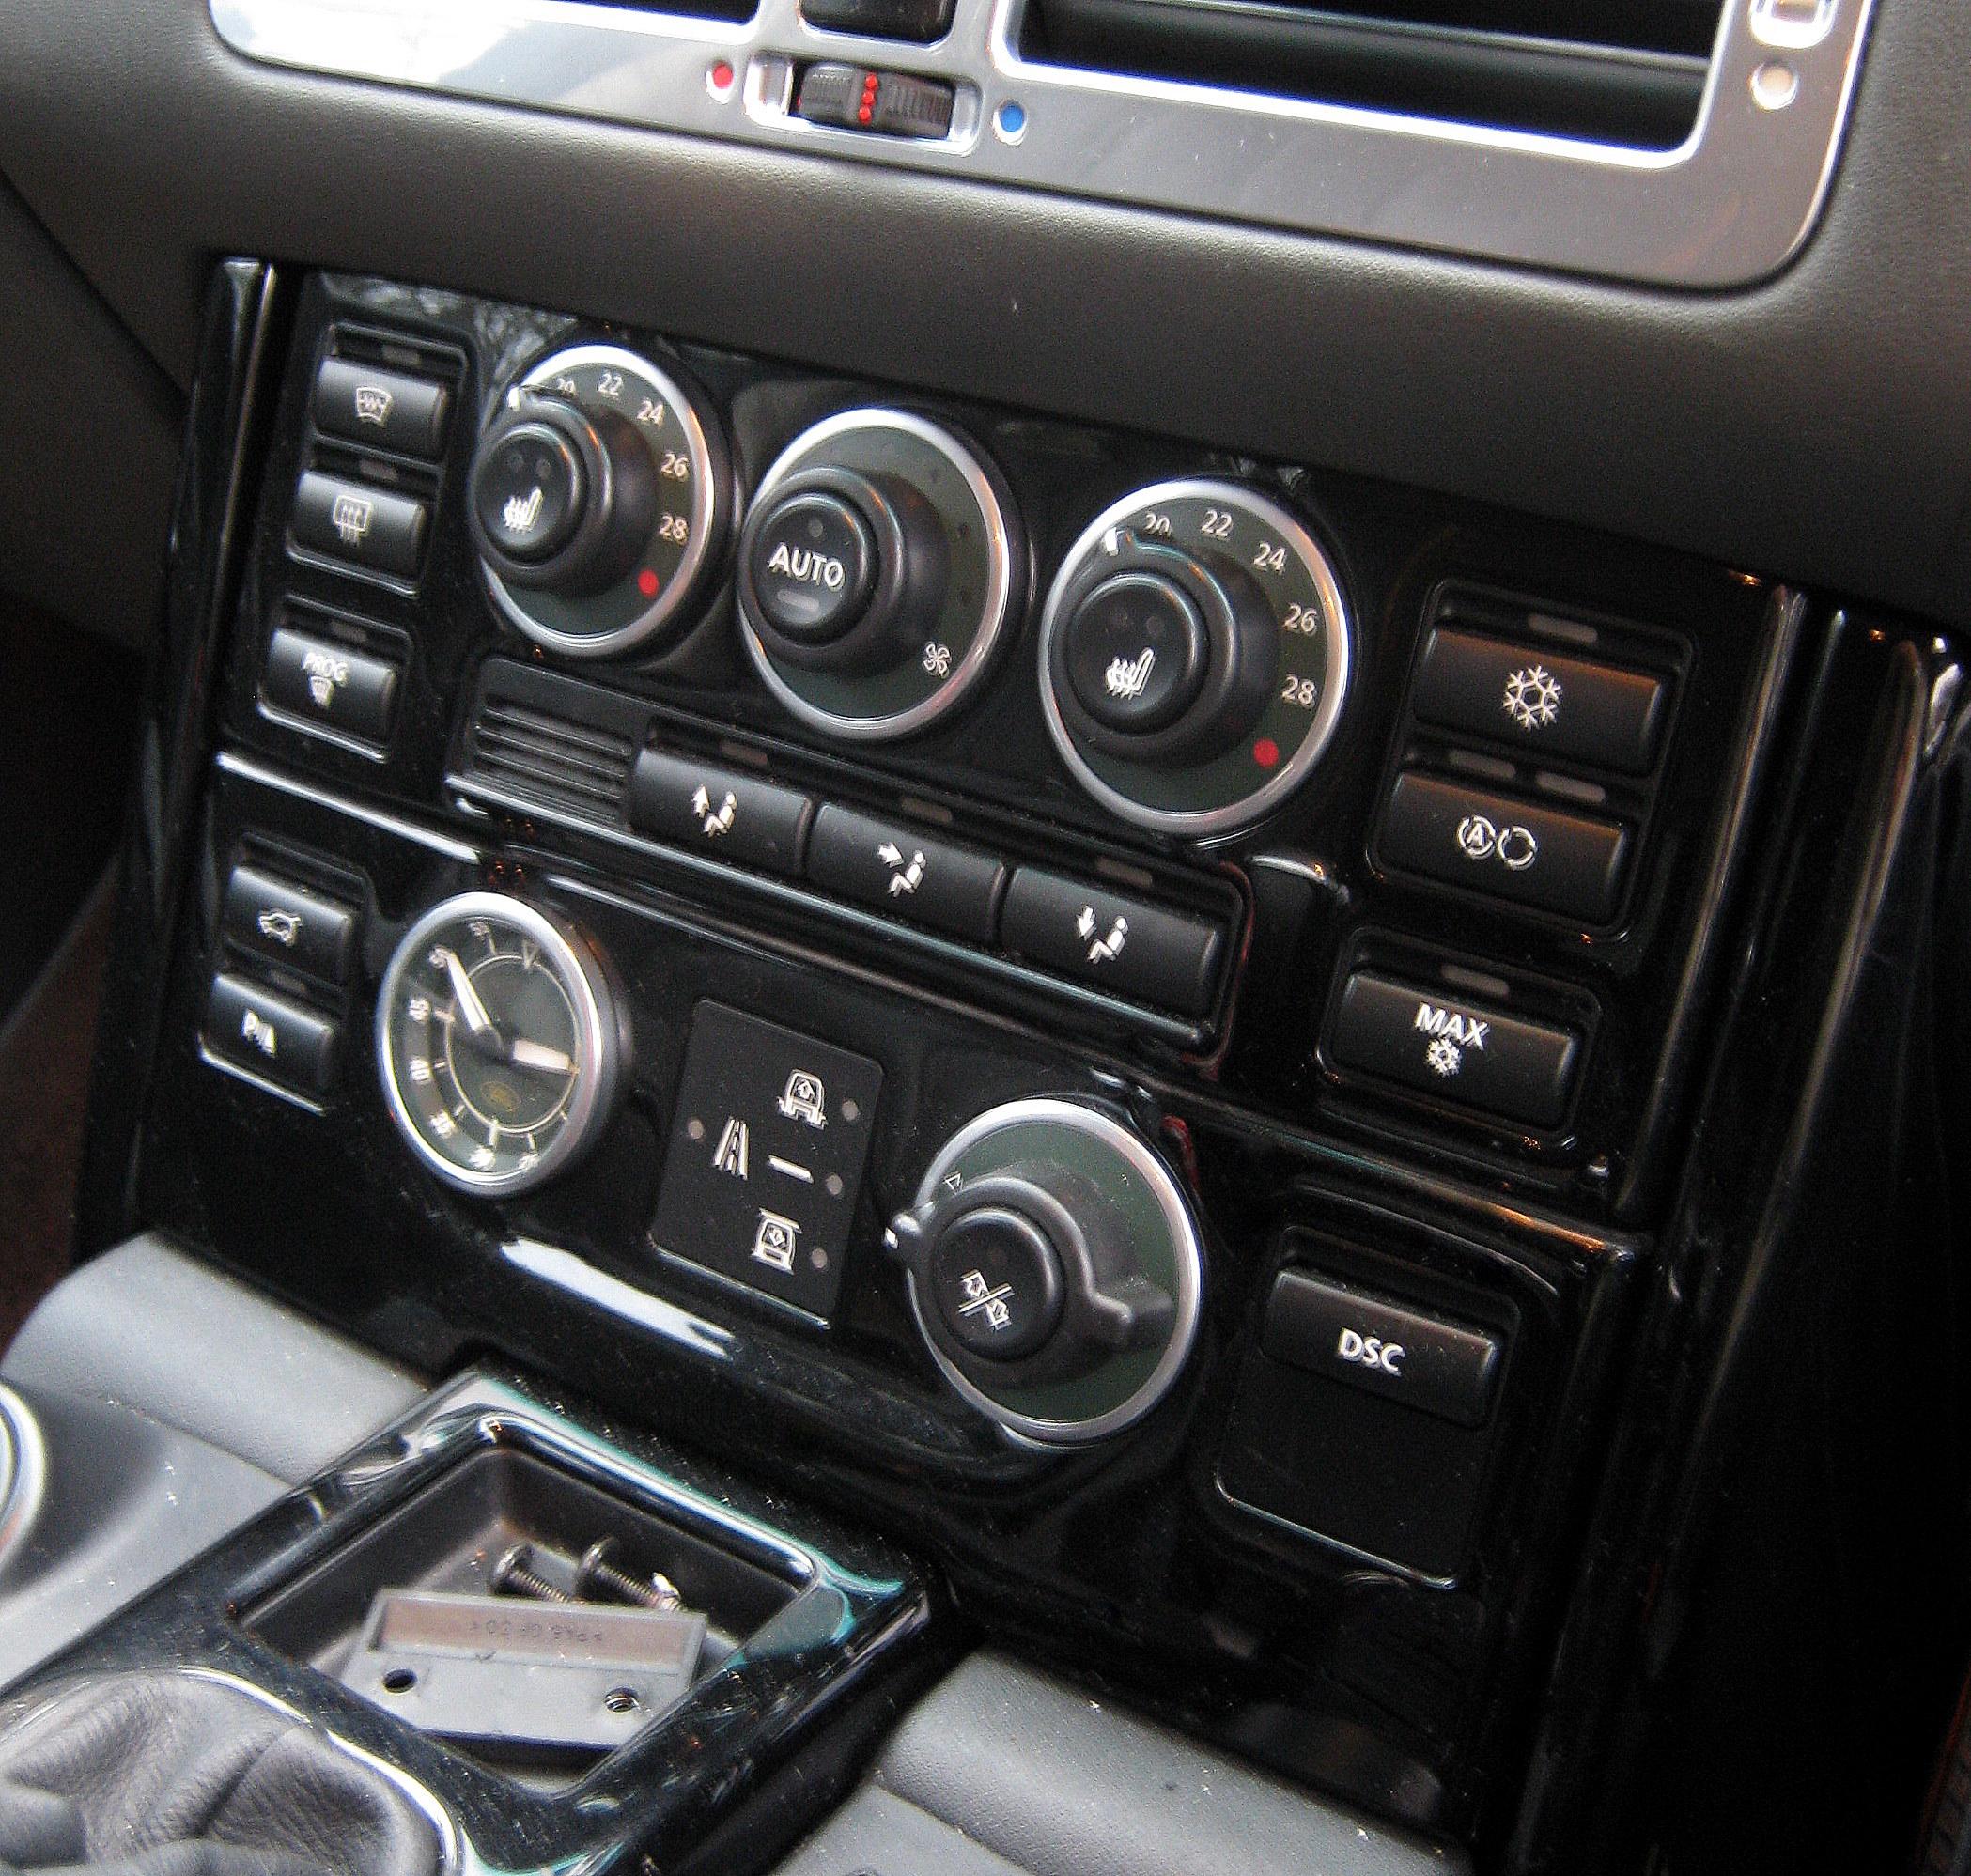 2002 Land Rover Range Rover Interior: Piano Black Gloss Interior Dash Fascia For Range Rover